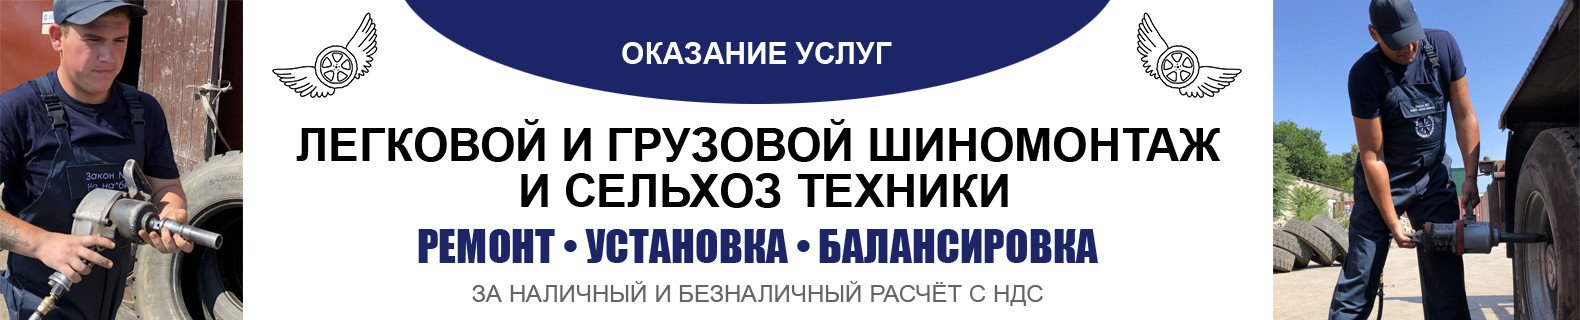 Шиномонтаж в Одессе